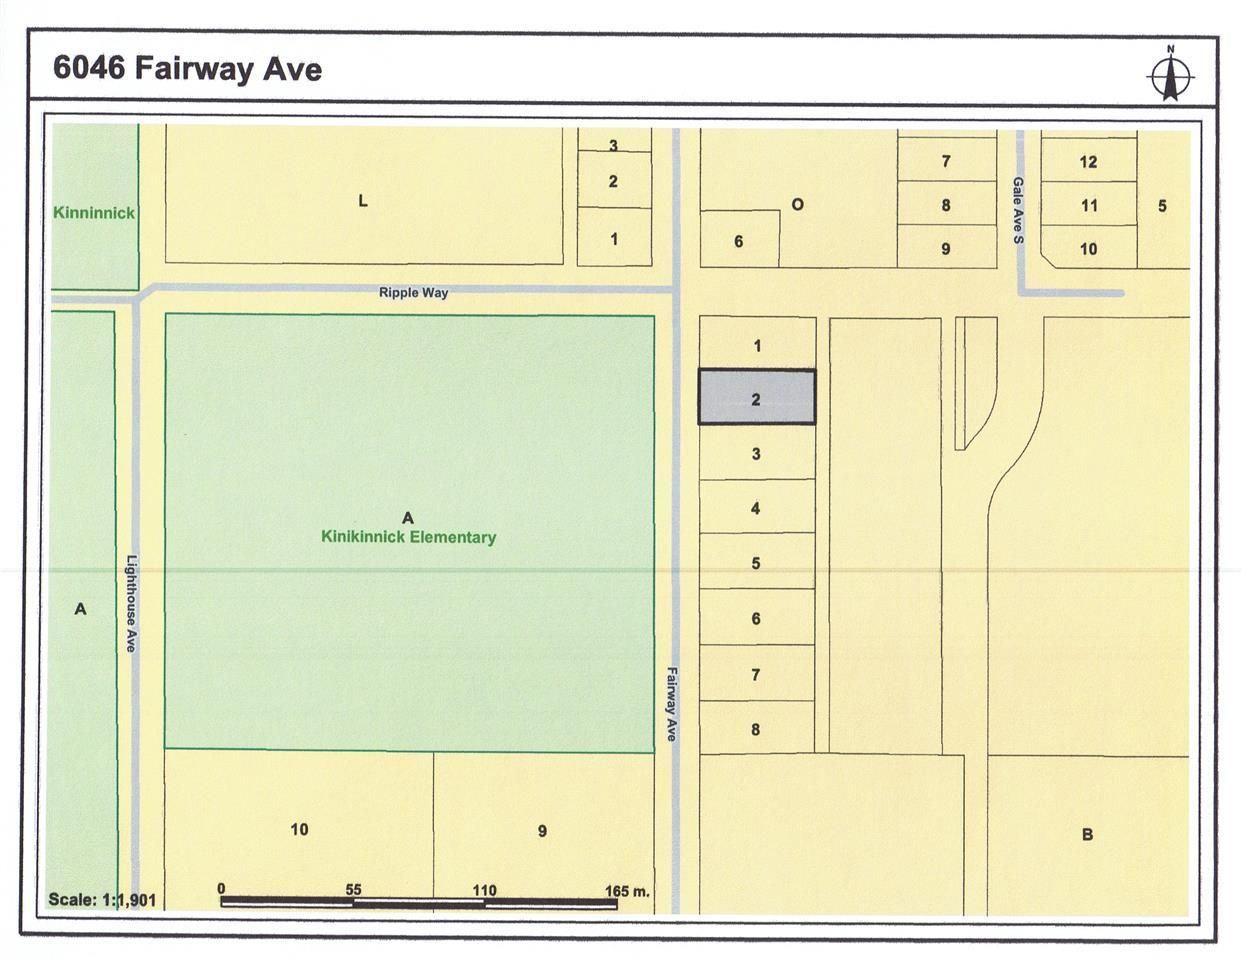 Main Photo: 6046 FAIRWAY Avenue in Sechelt: Sechelt District Home for sale (Sunshine Coast)  : MLS®# R2259631